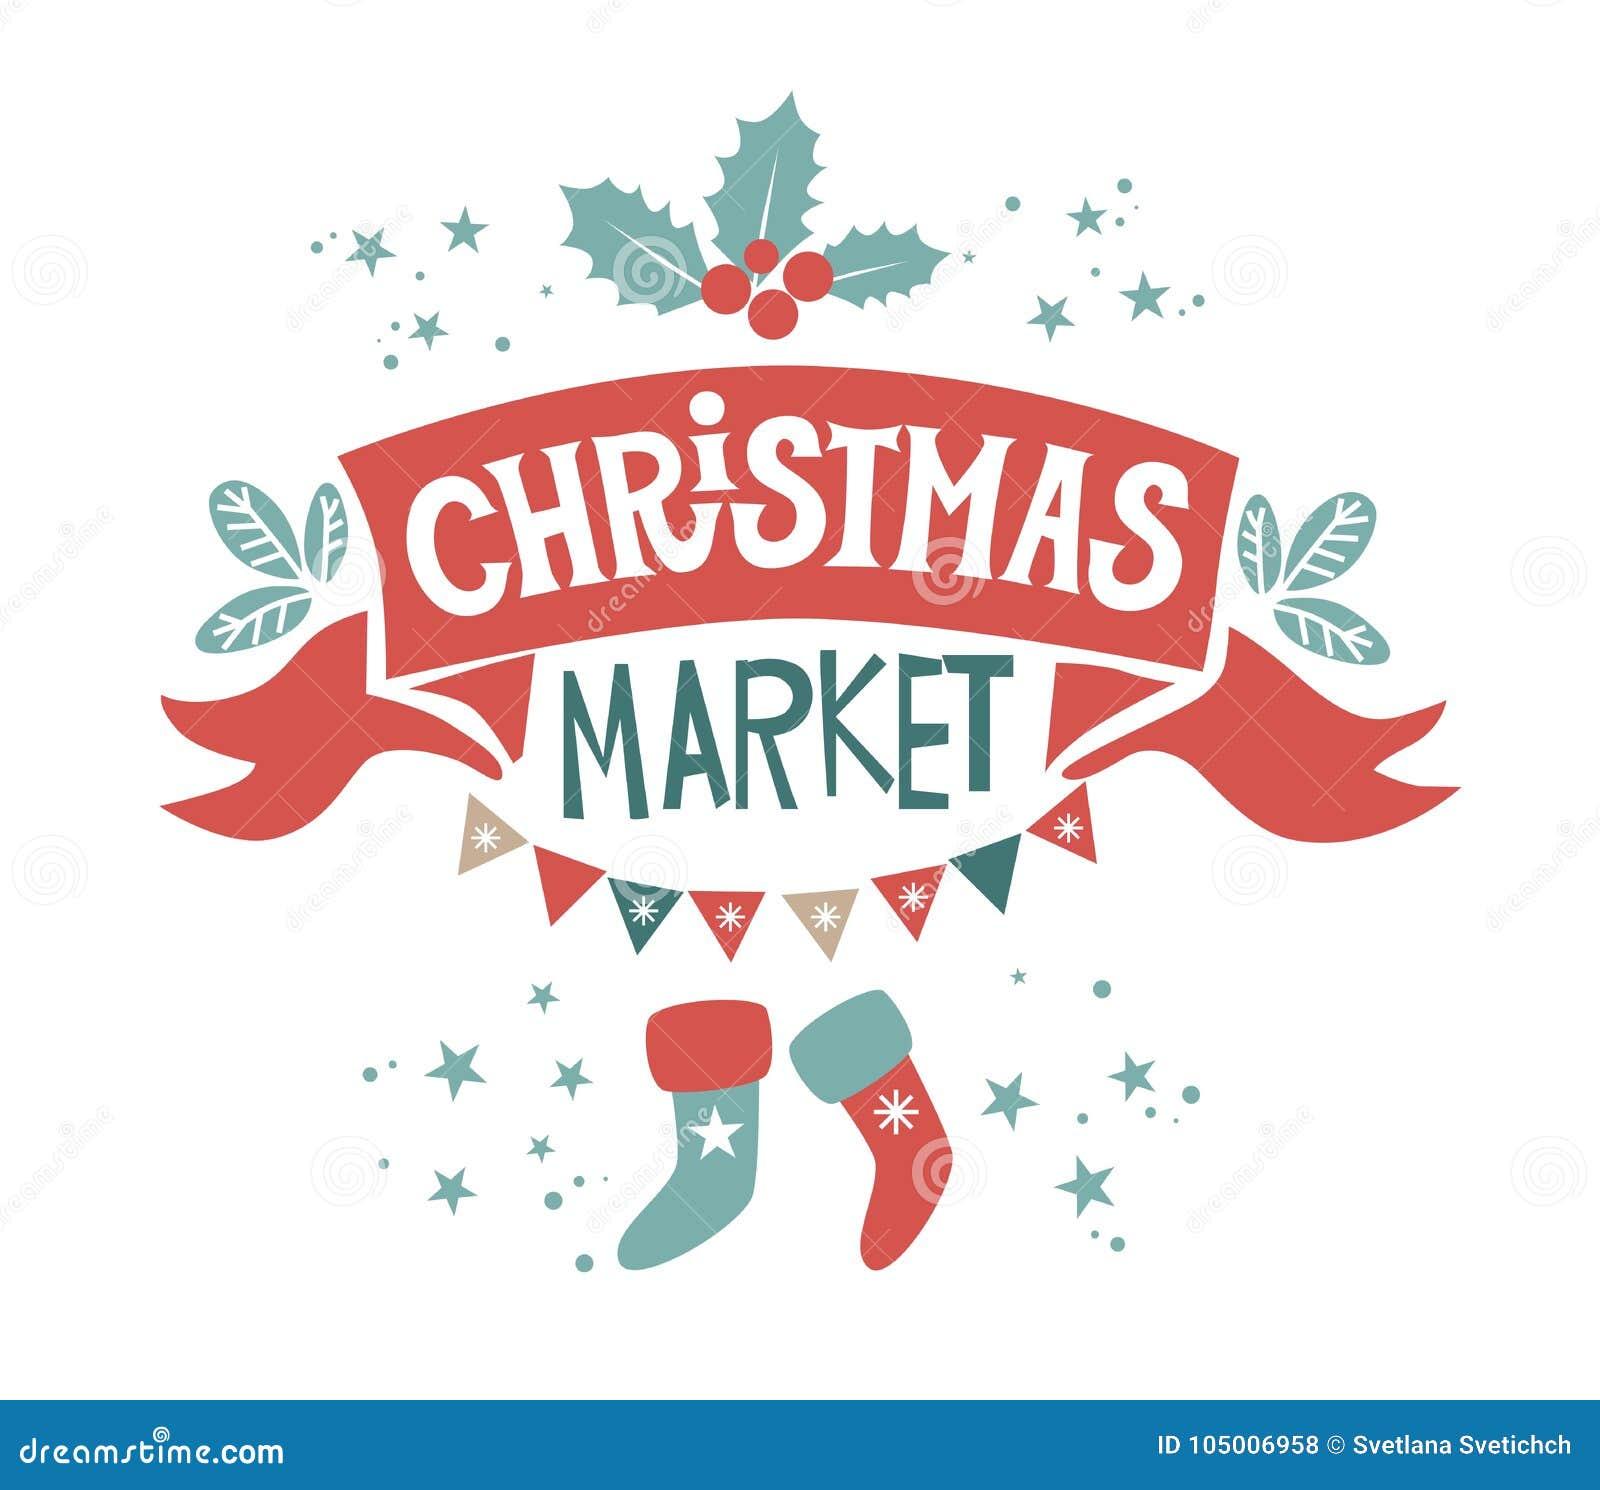 Christmas Market Illustration Stock Vector - Illustration of cute ...